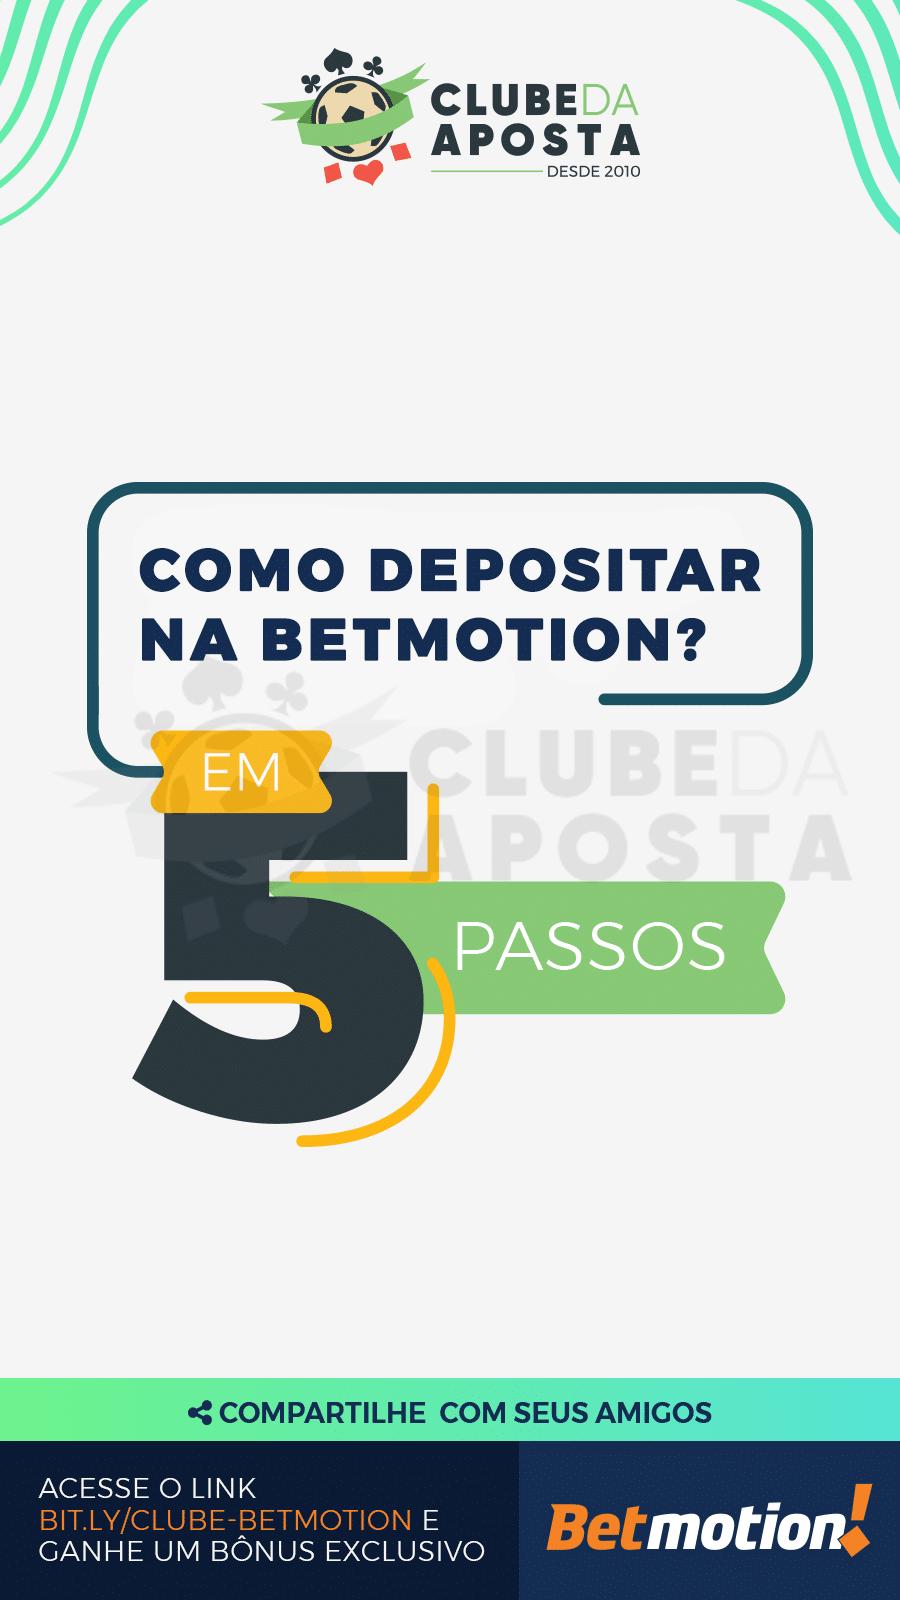 como-depositar-na-Betmotion_passos